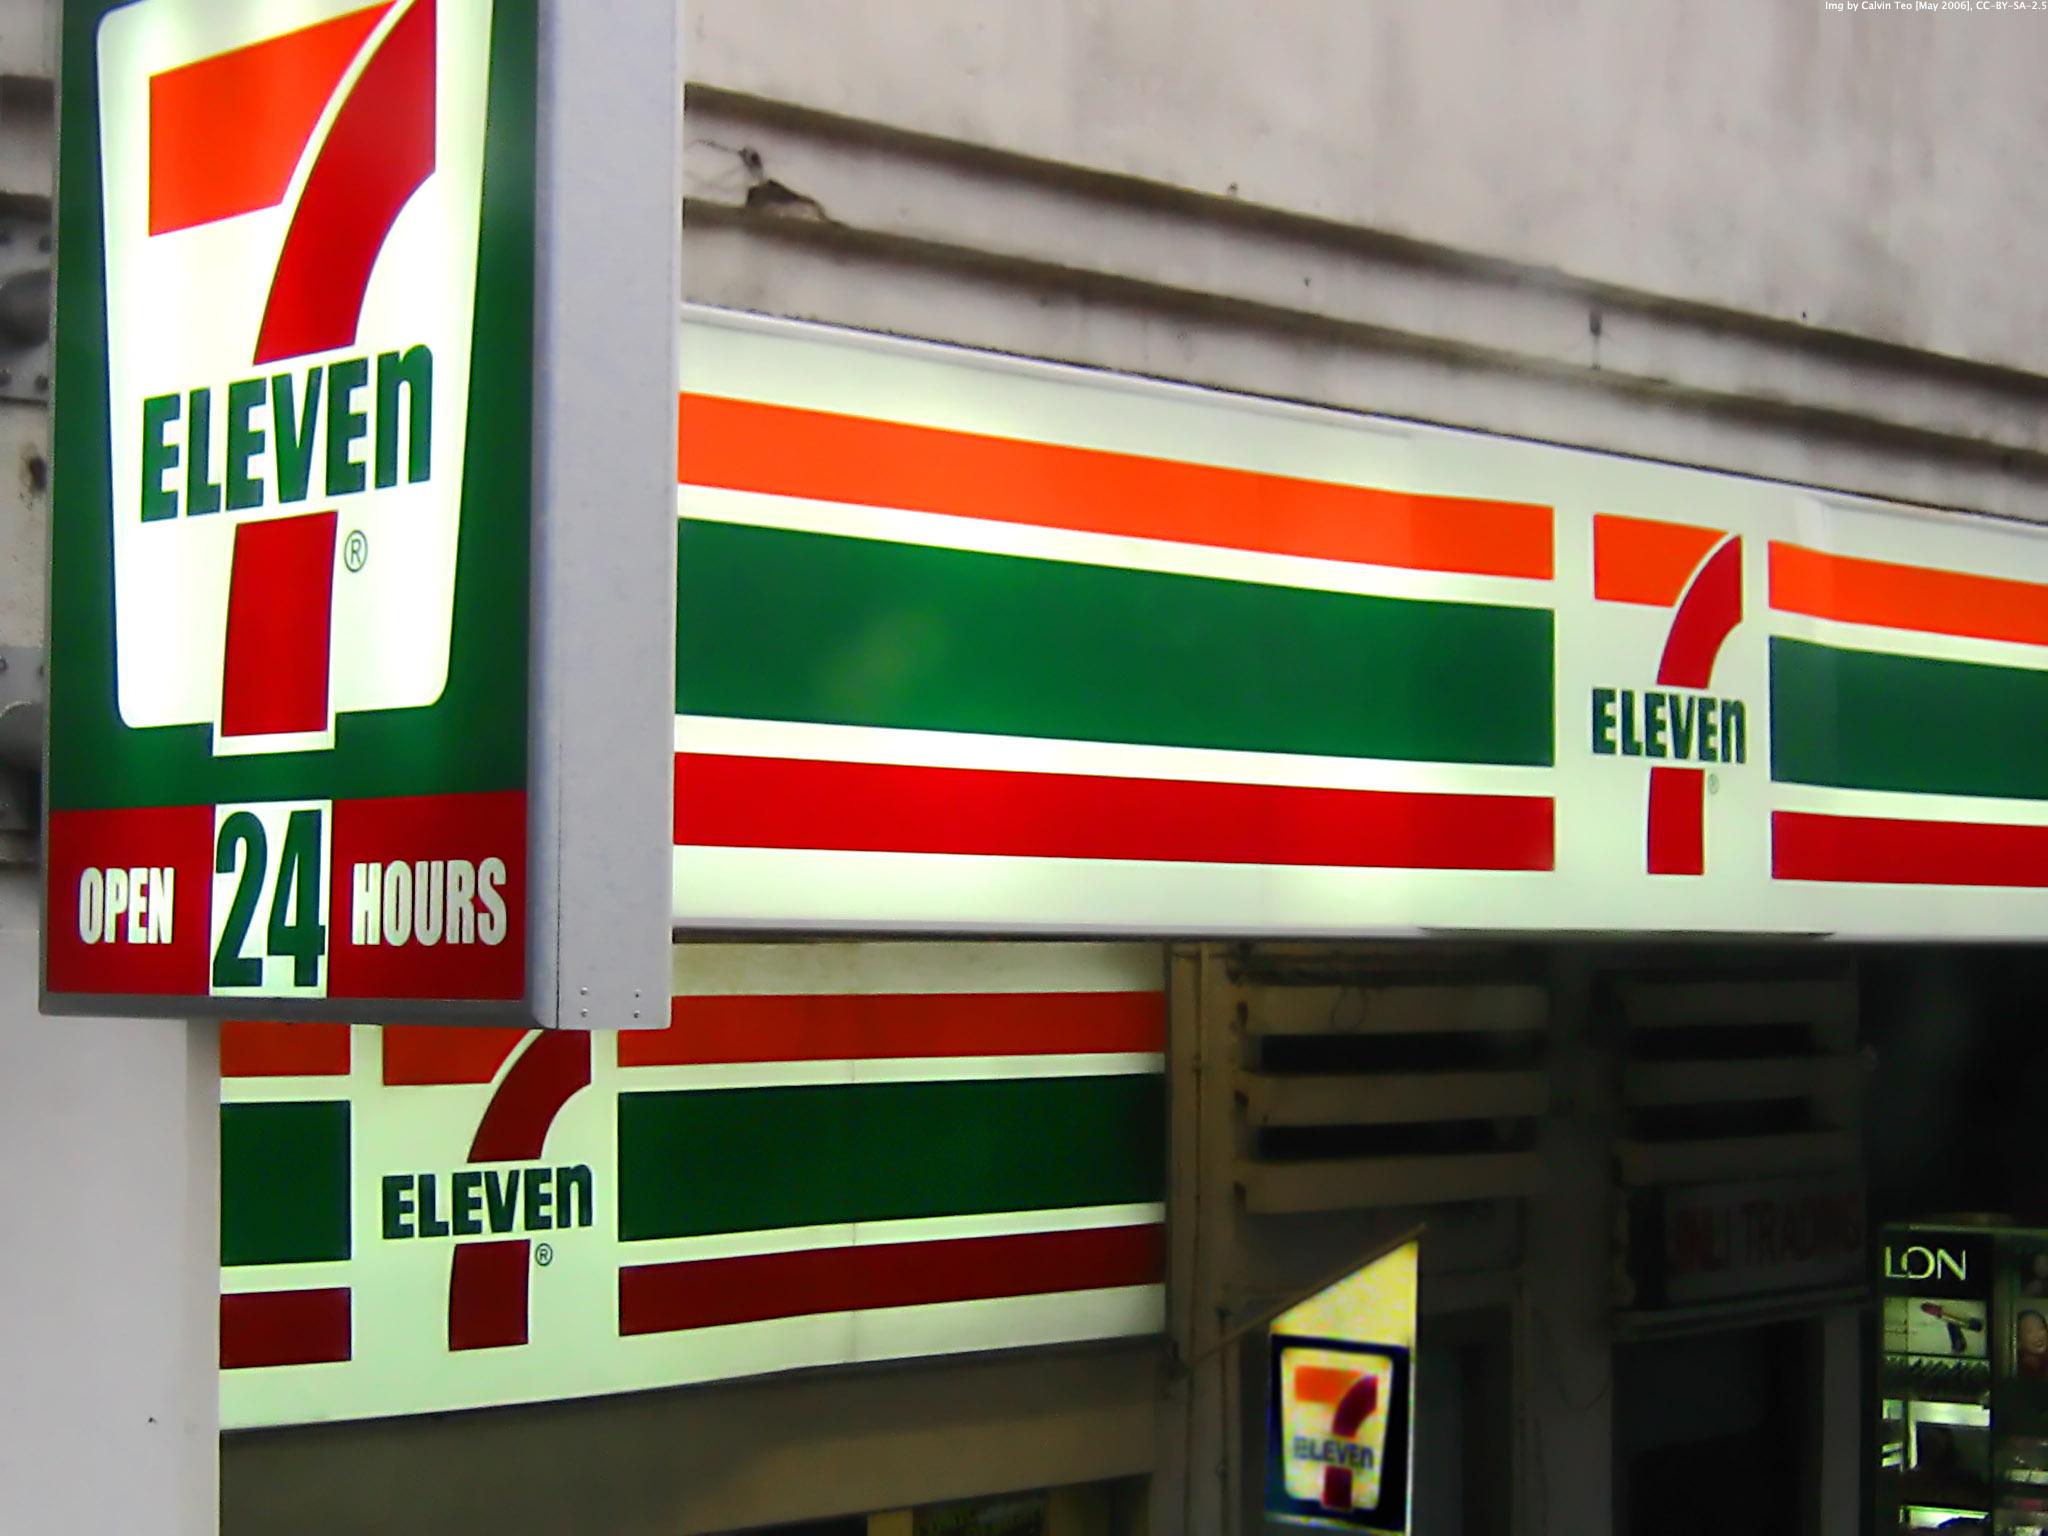 7-eleven franchise fined heavily